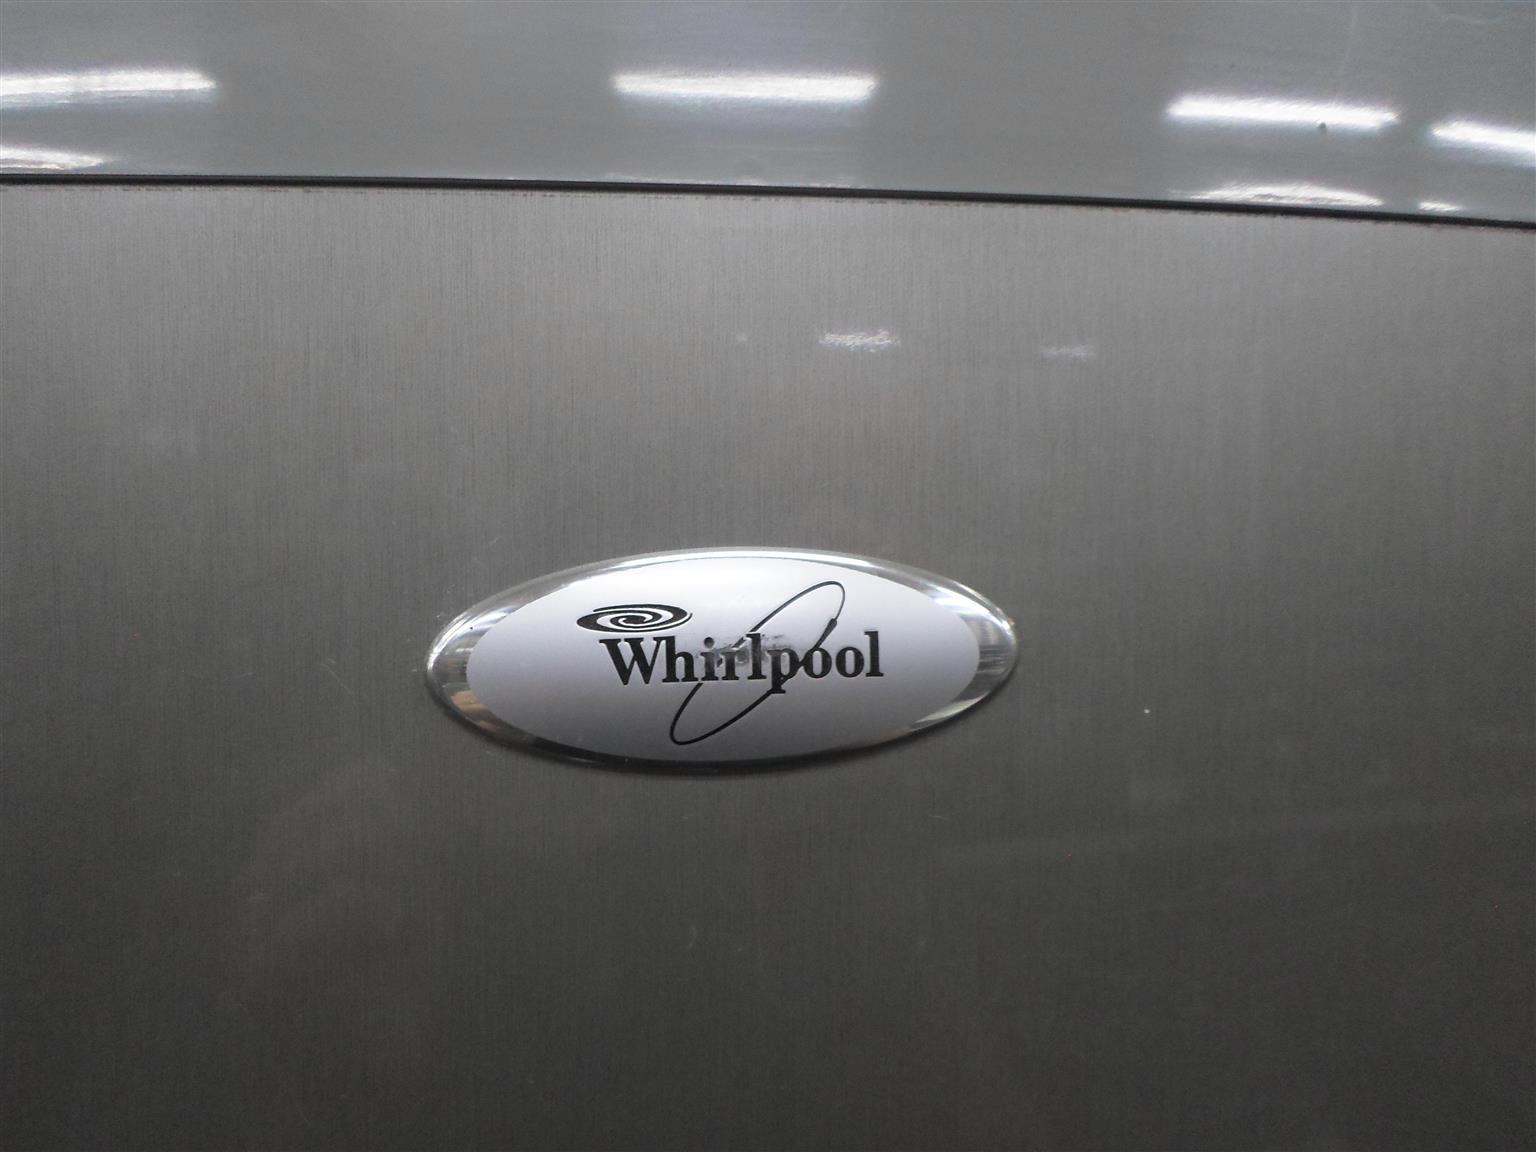 Whirlpool Fridge / Freezer - B033050033-2